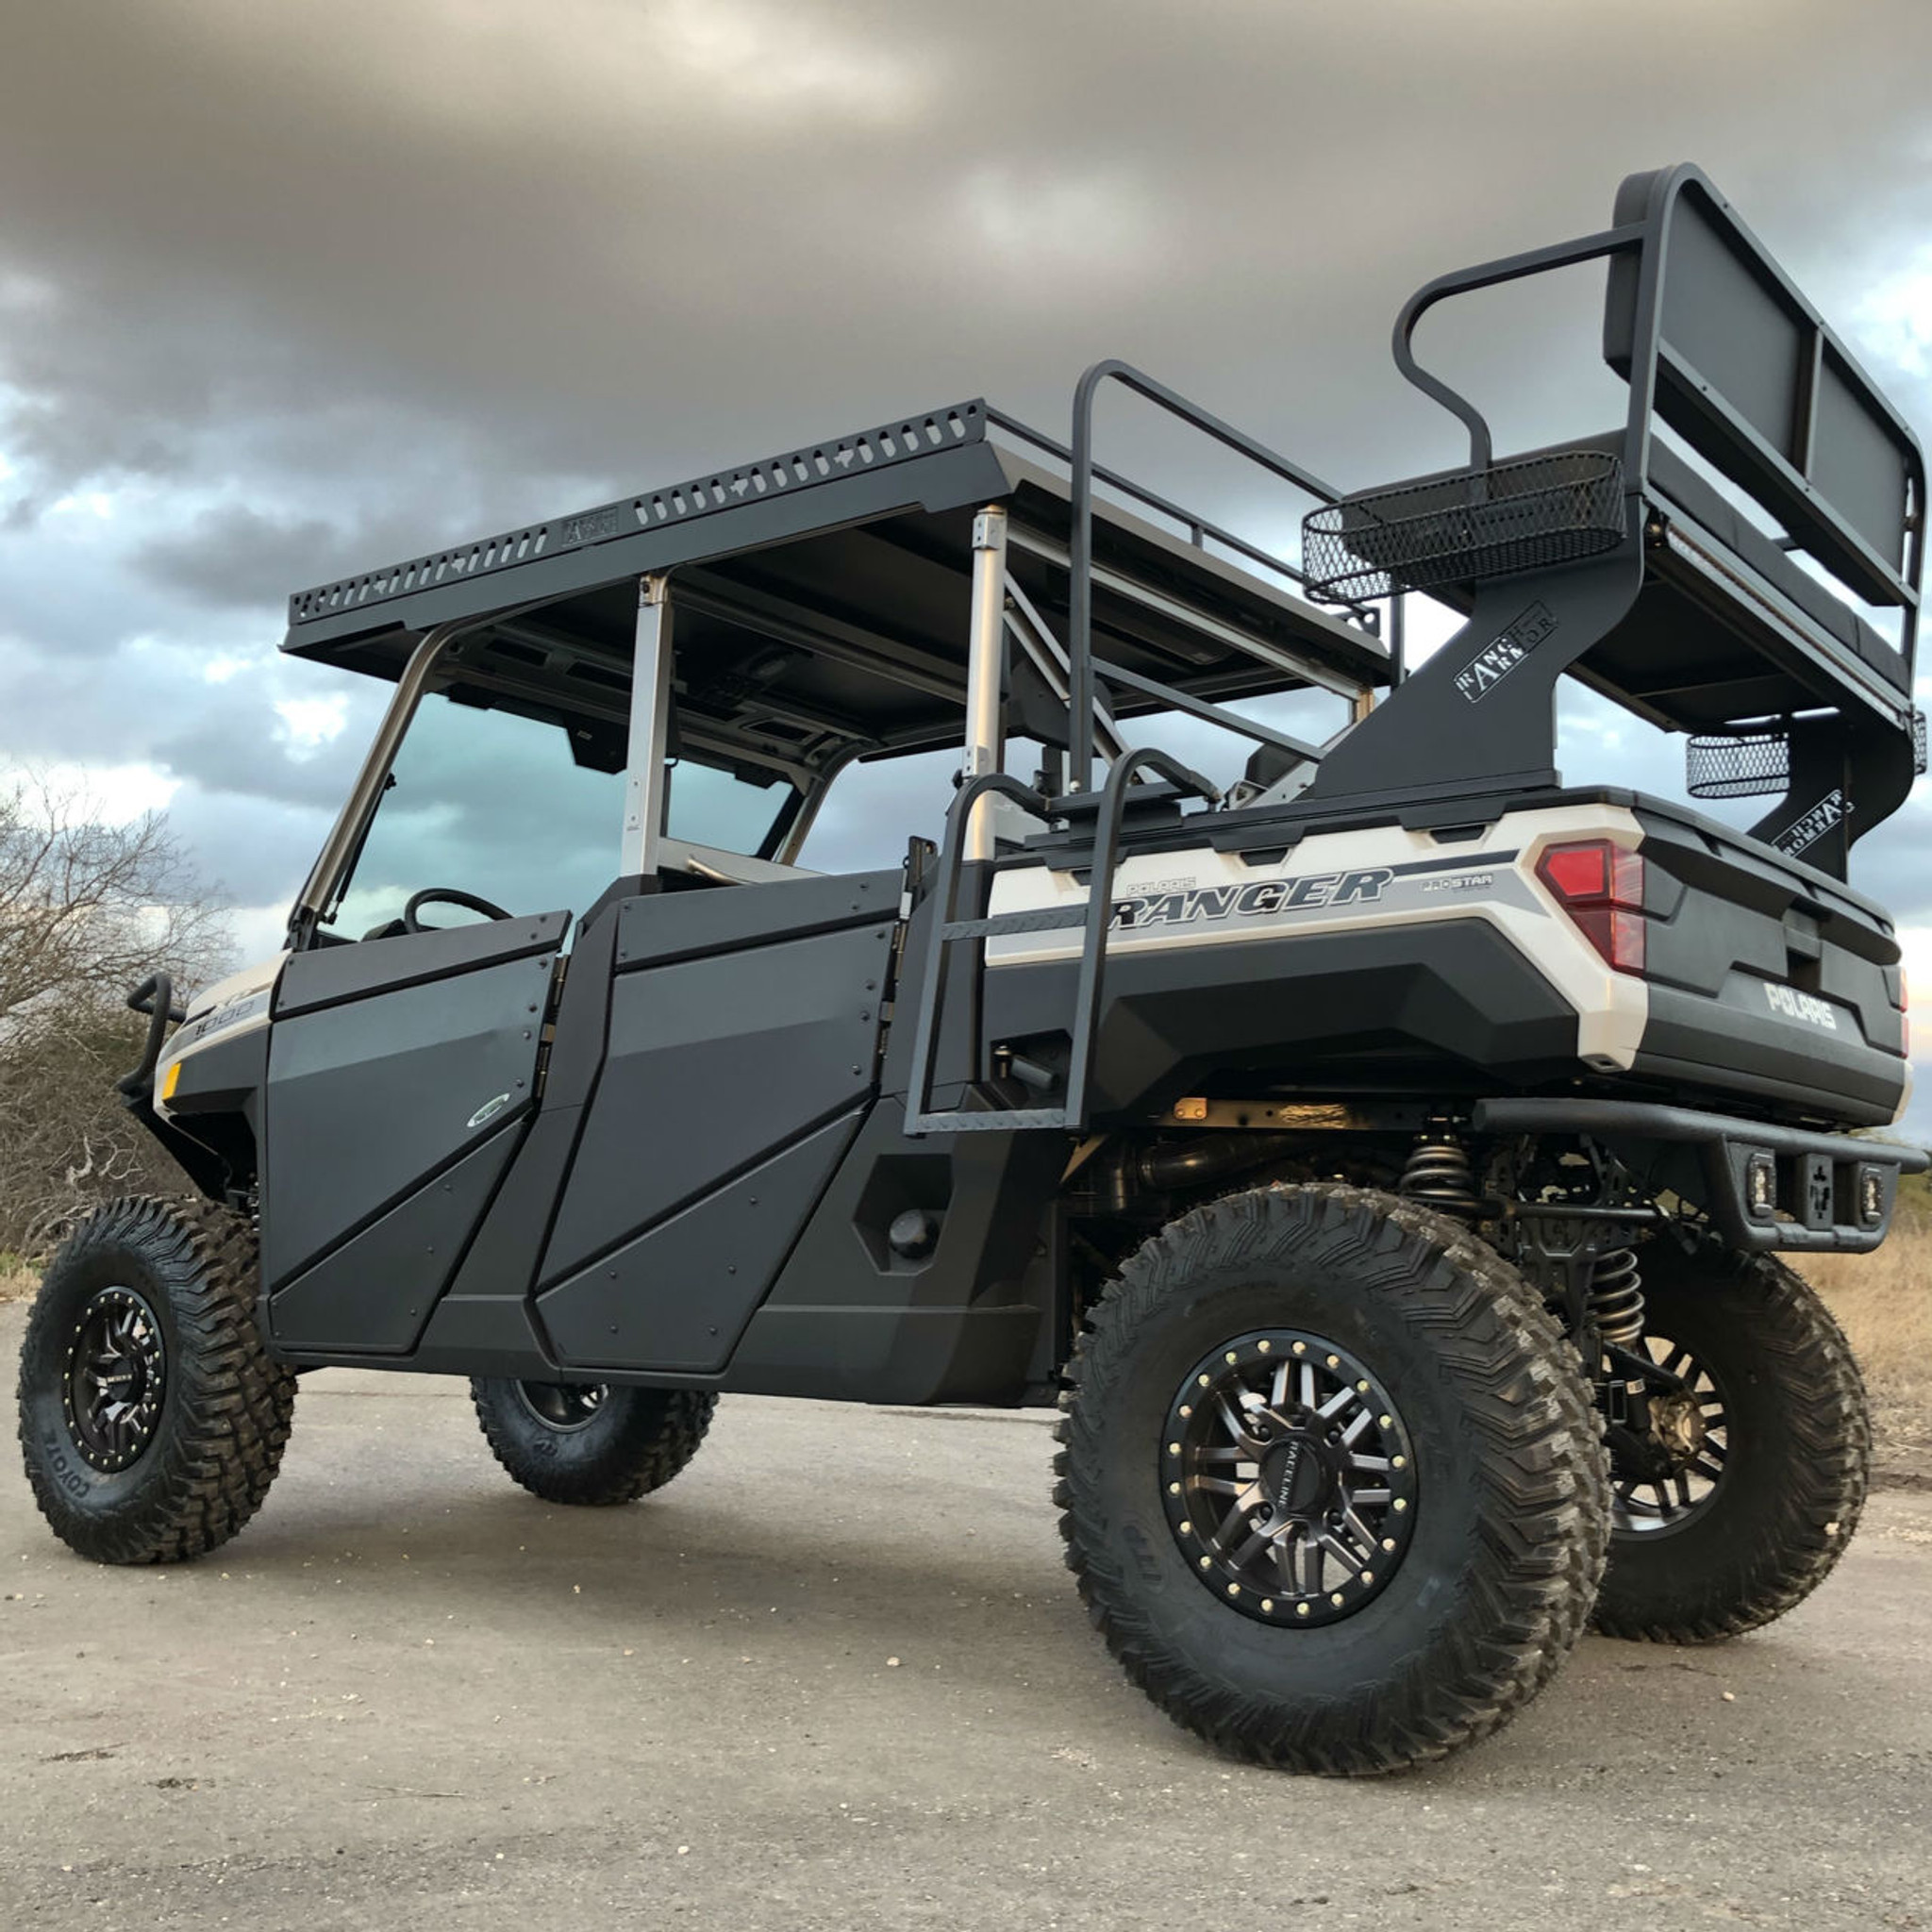 SOLD - 2019 Polaris Ranger 1000 Crew - Project Spurs - Texas